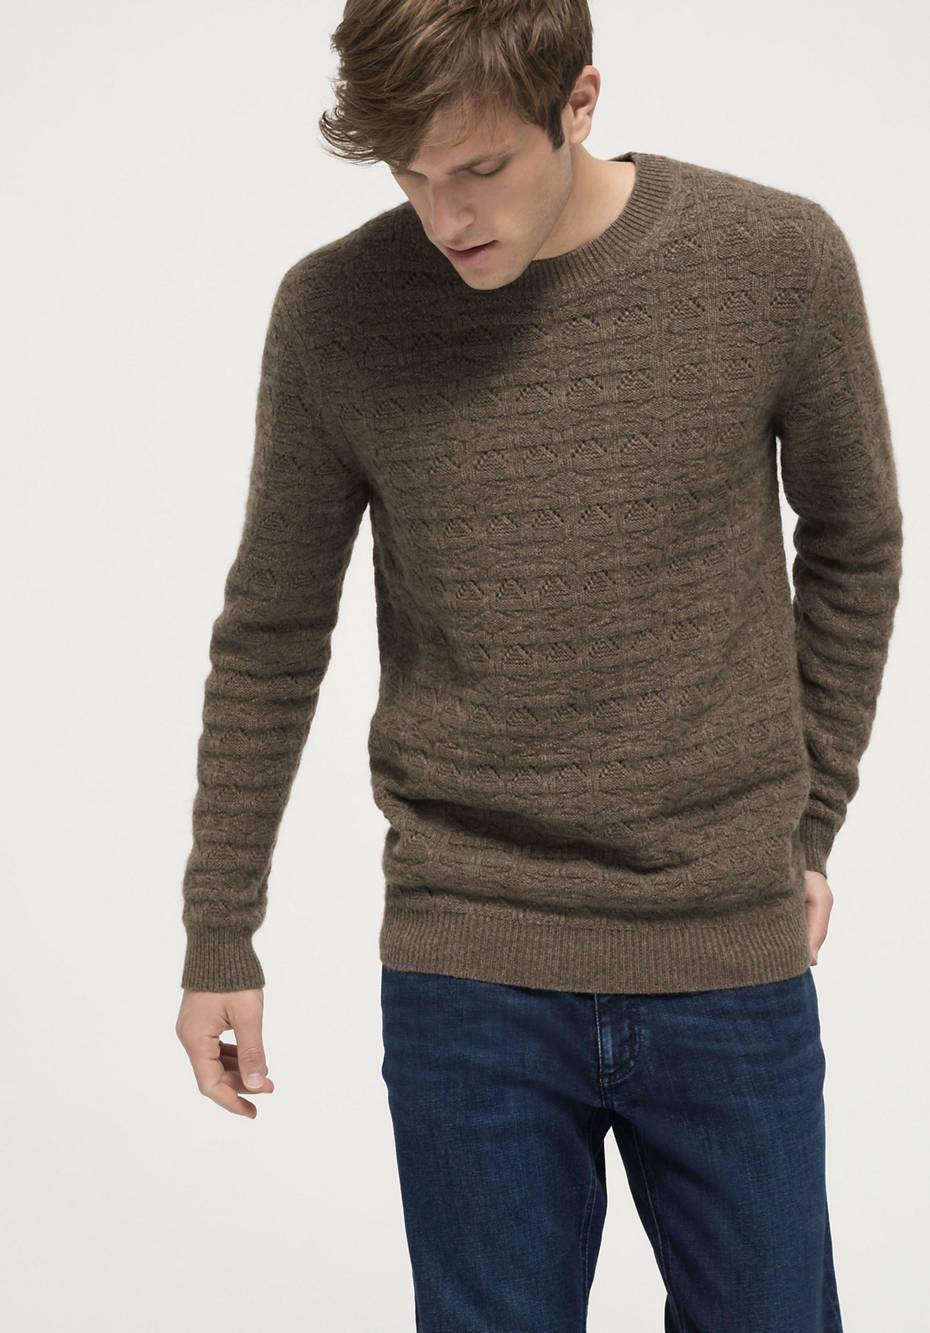 Pure yak sweater